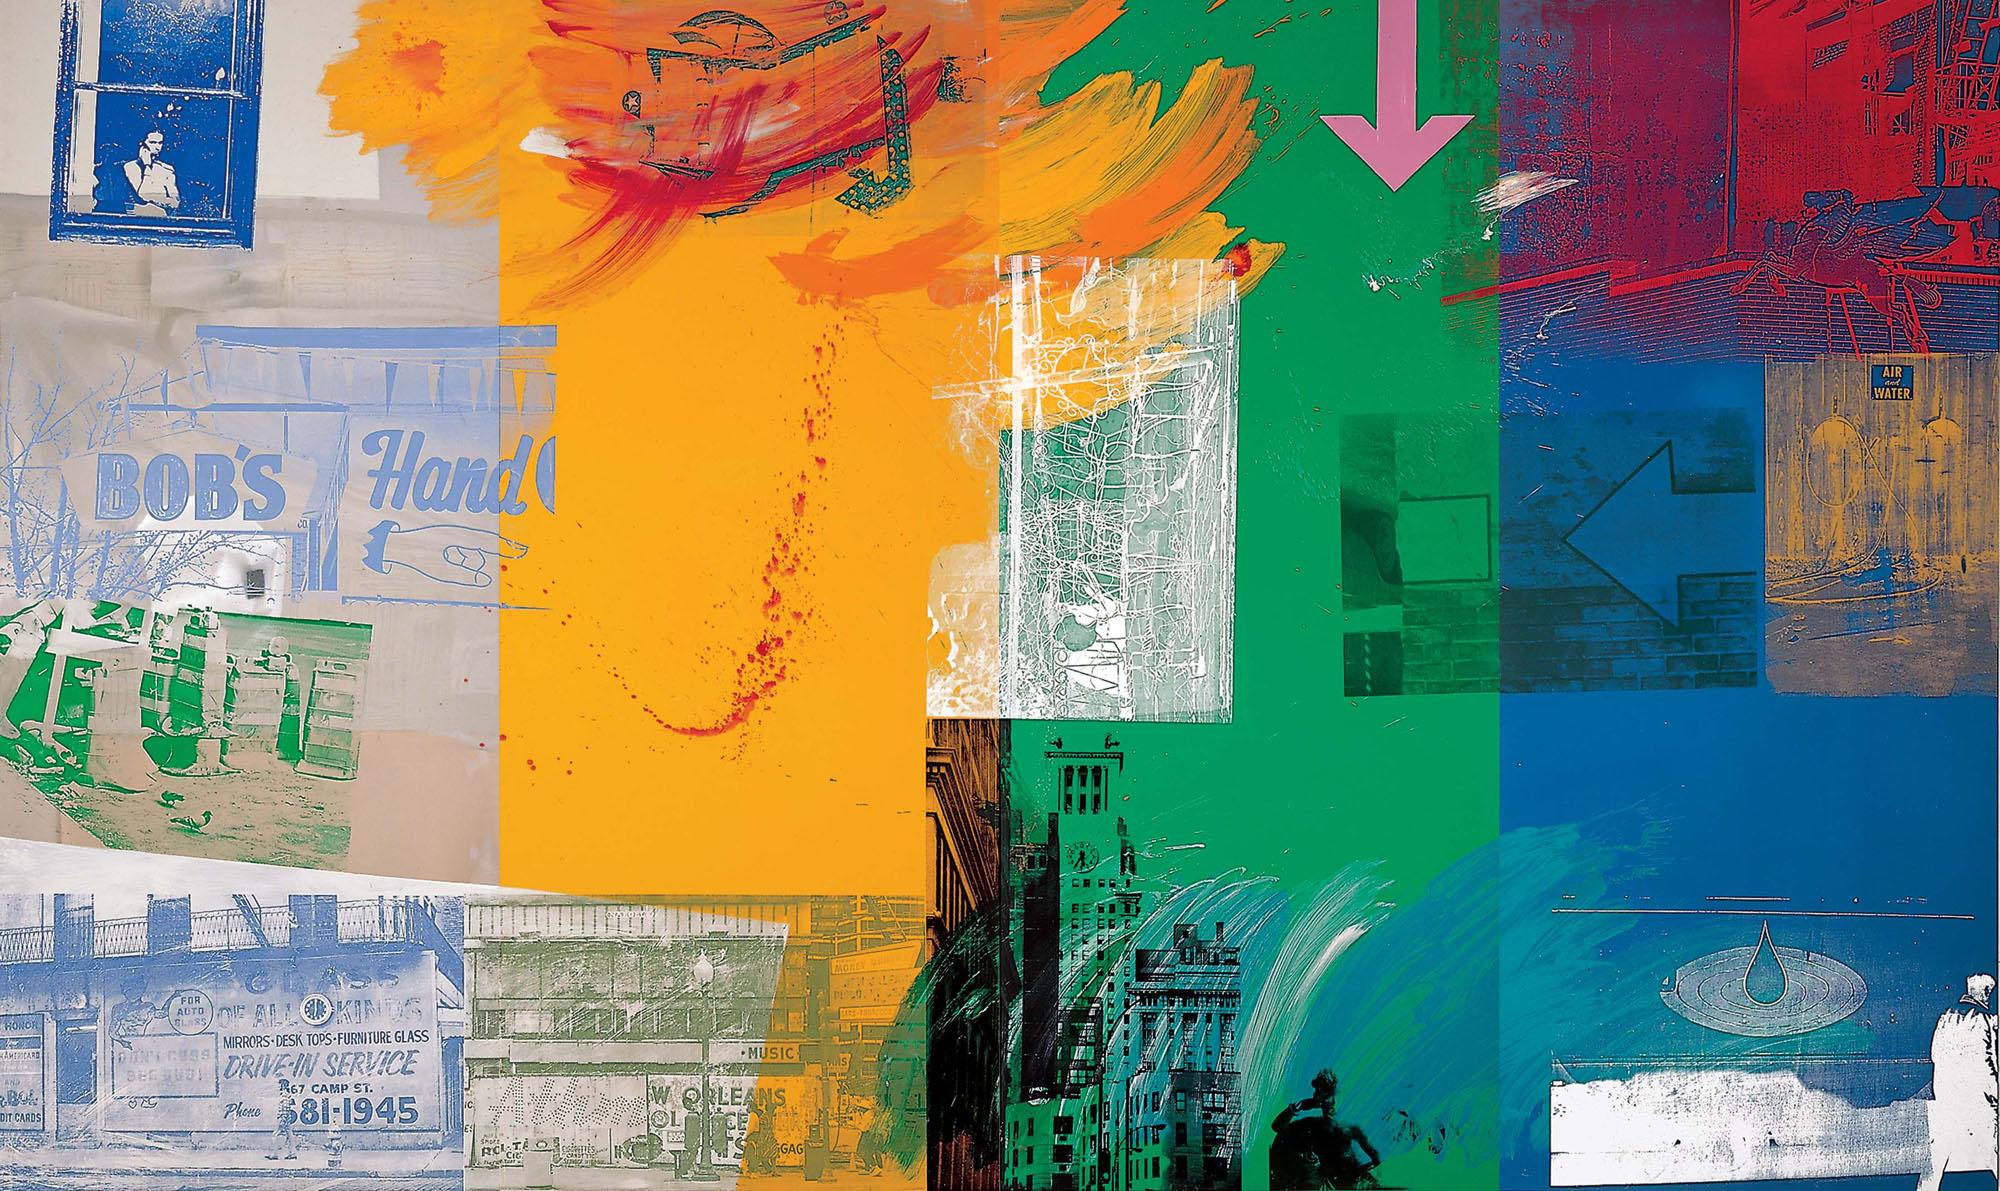 © Robert Rauschenberg Foundation. Catch (Urban Bourbon), 1993 Acrylic on mirrored and enameled aluminum (294.6 x 490.9 cm) Robert Rauschenberg Foundation